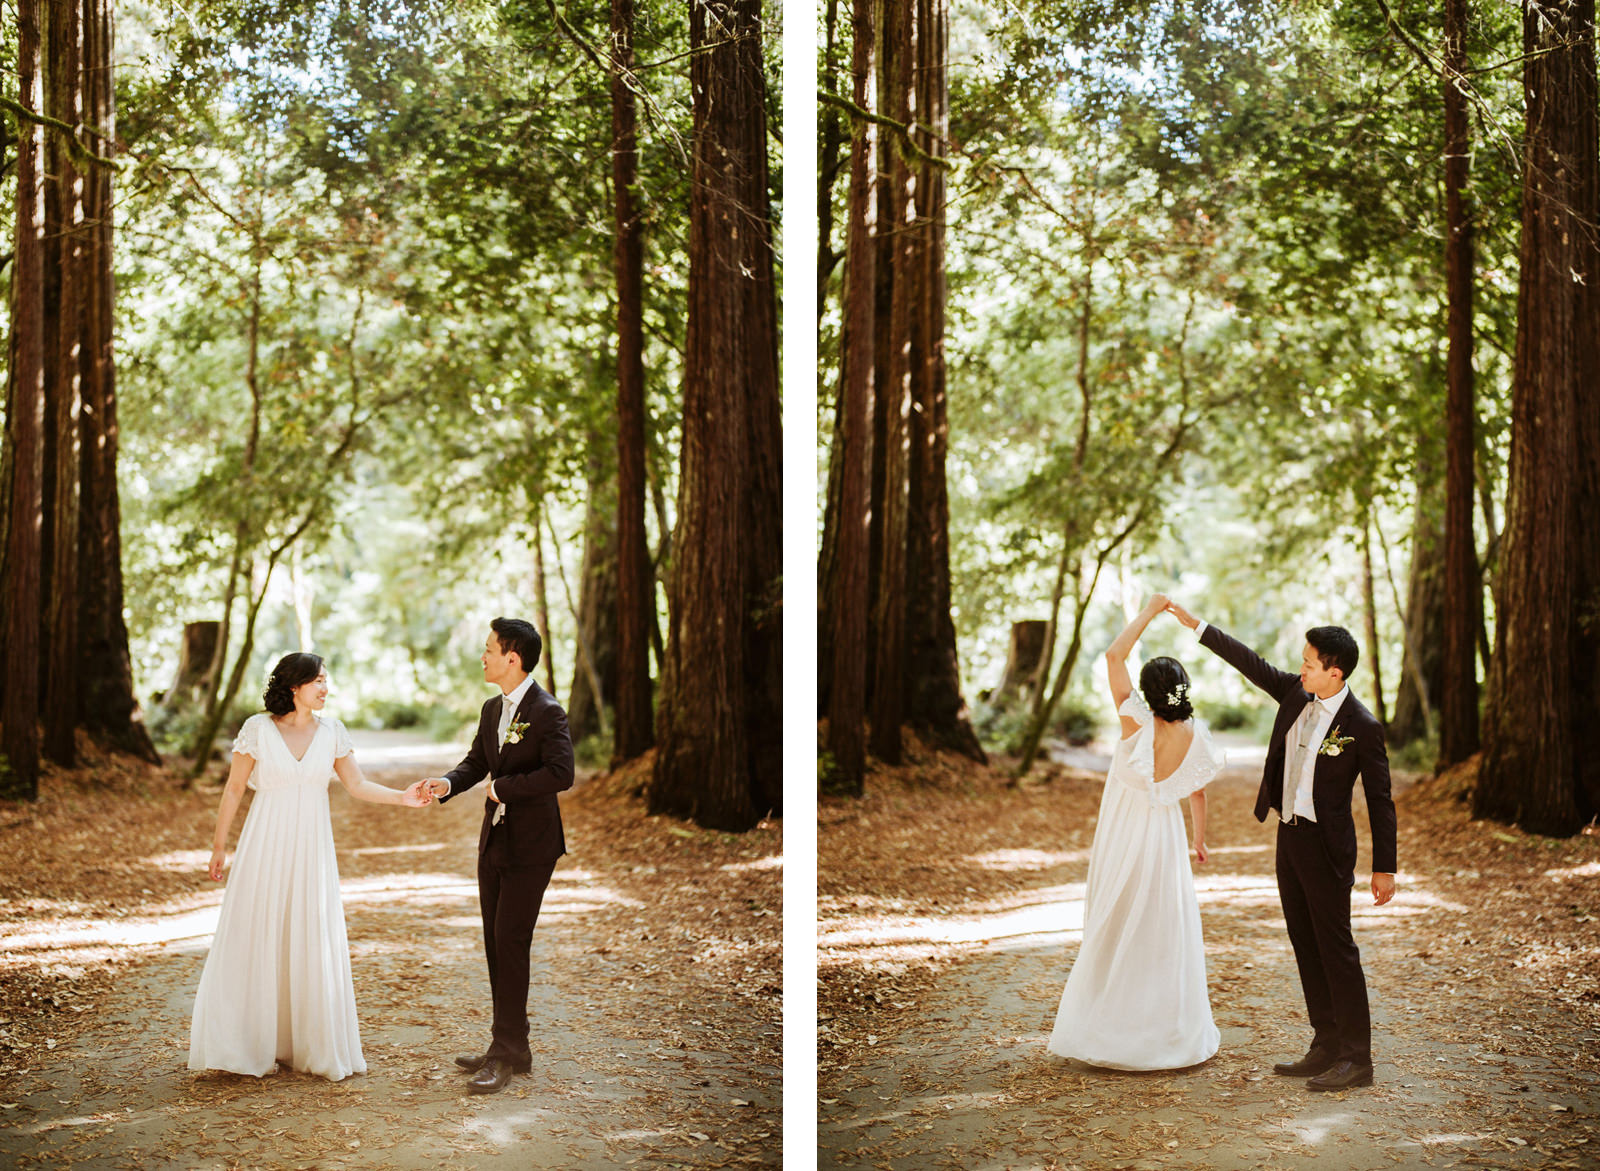 kimclay-blog-049 REDWOOD FOREST WEDDING